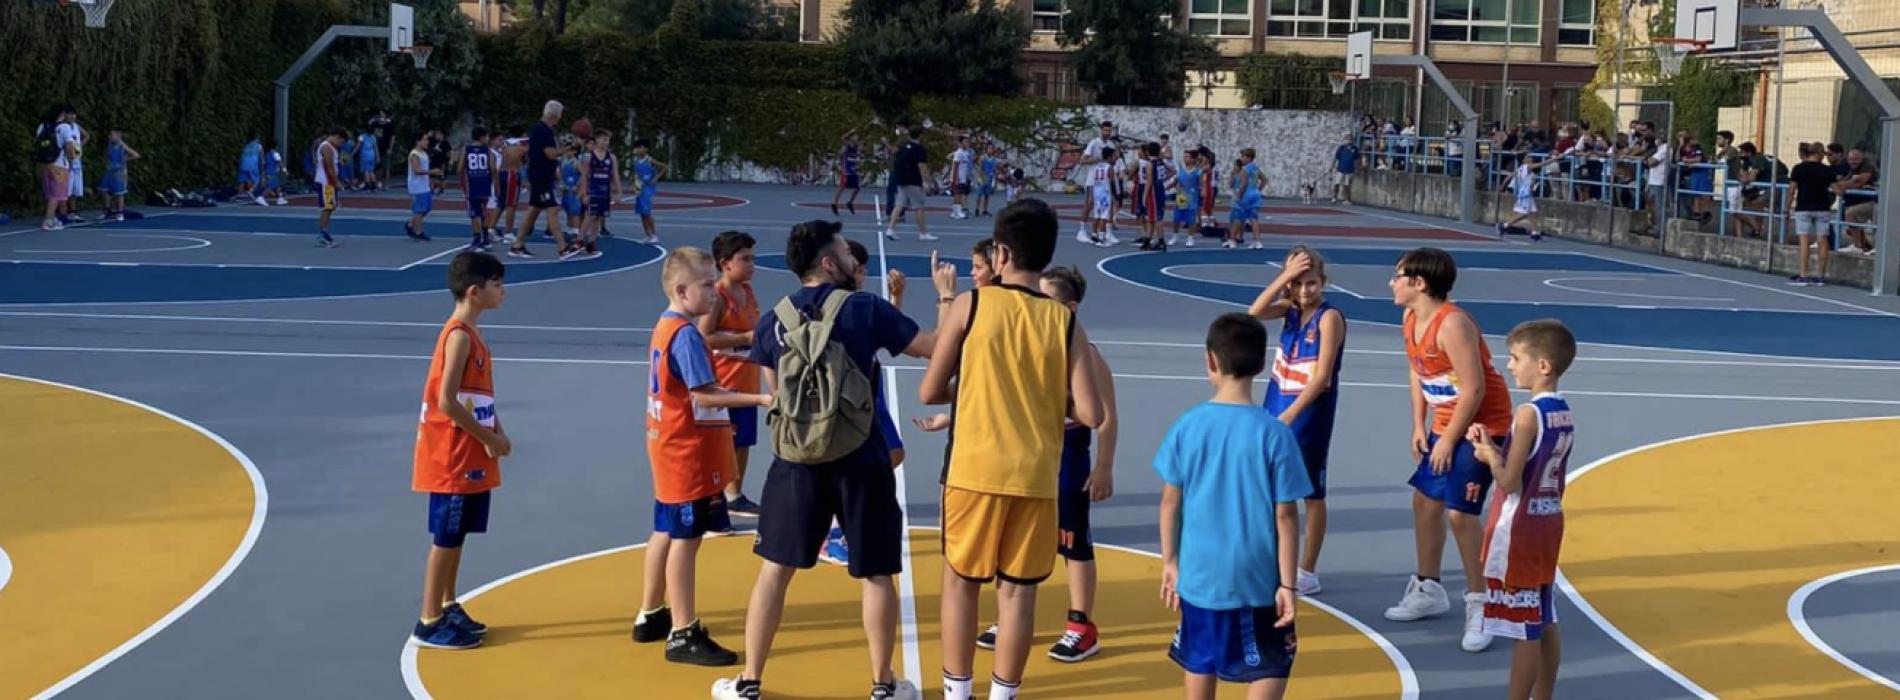 Juvecaserta Academy, il minibasket si impara anche a cinema